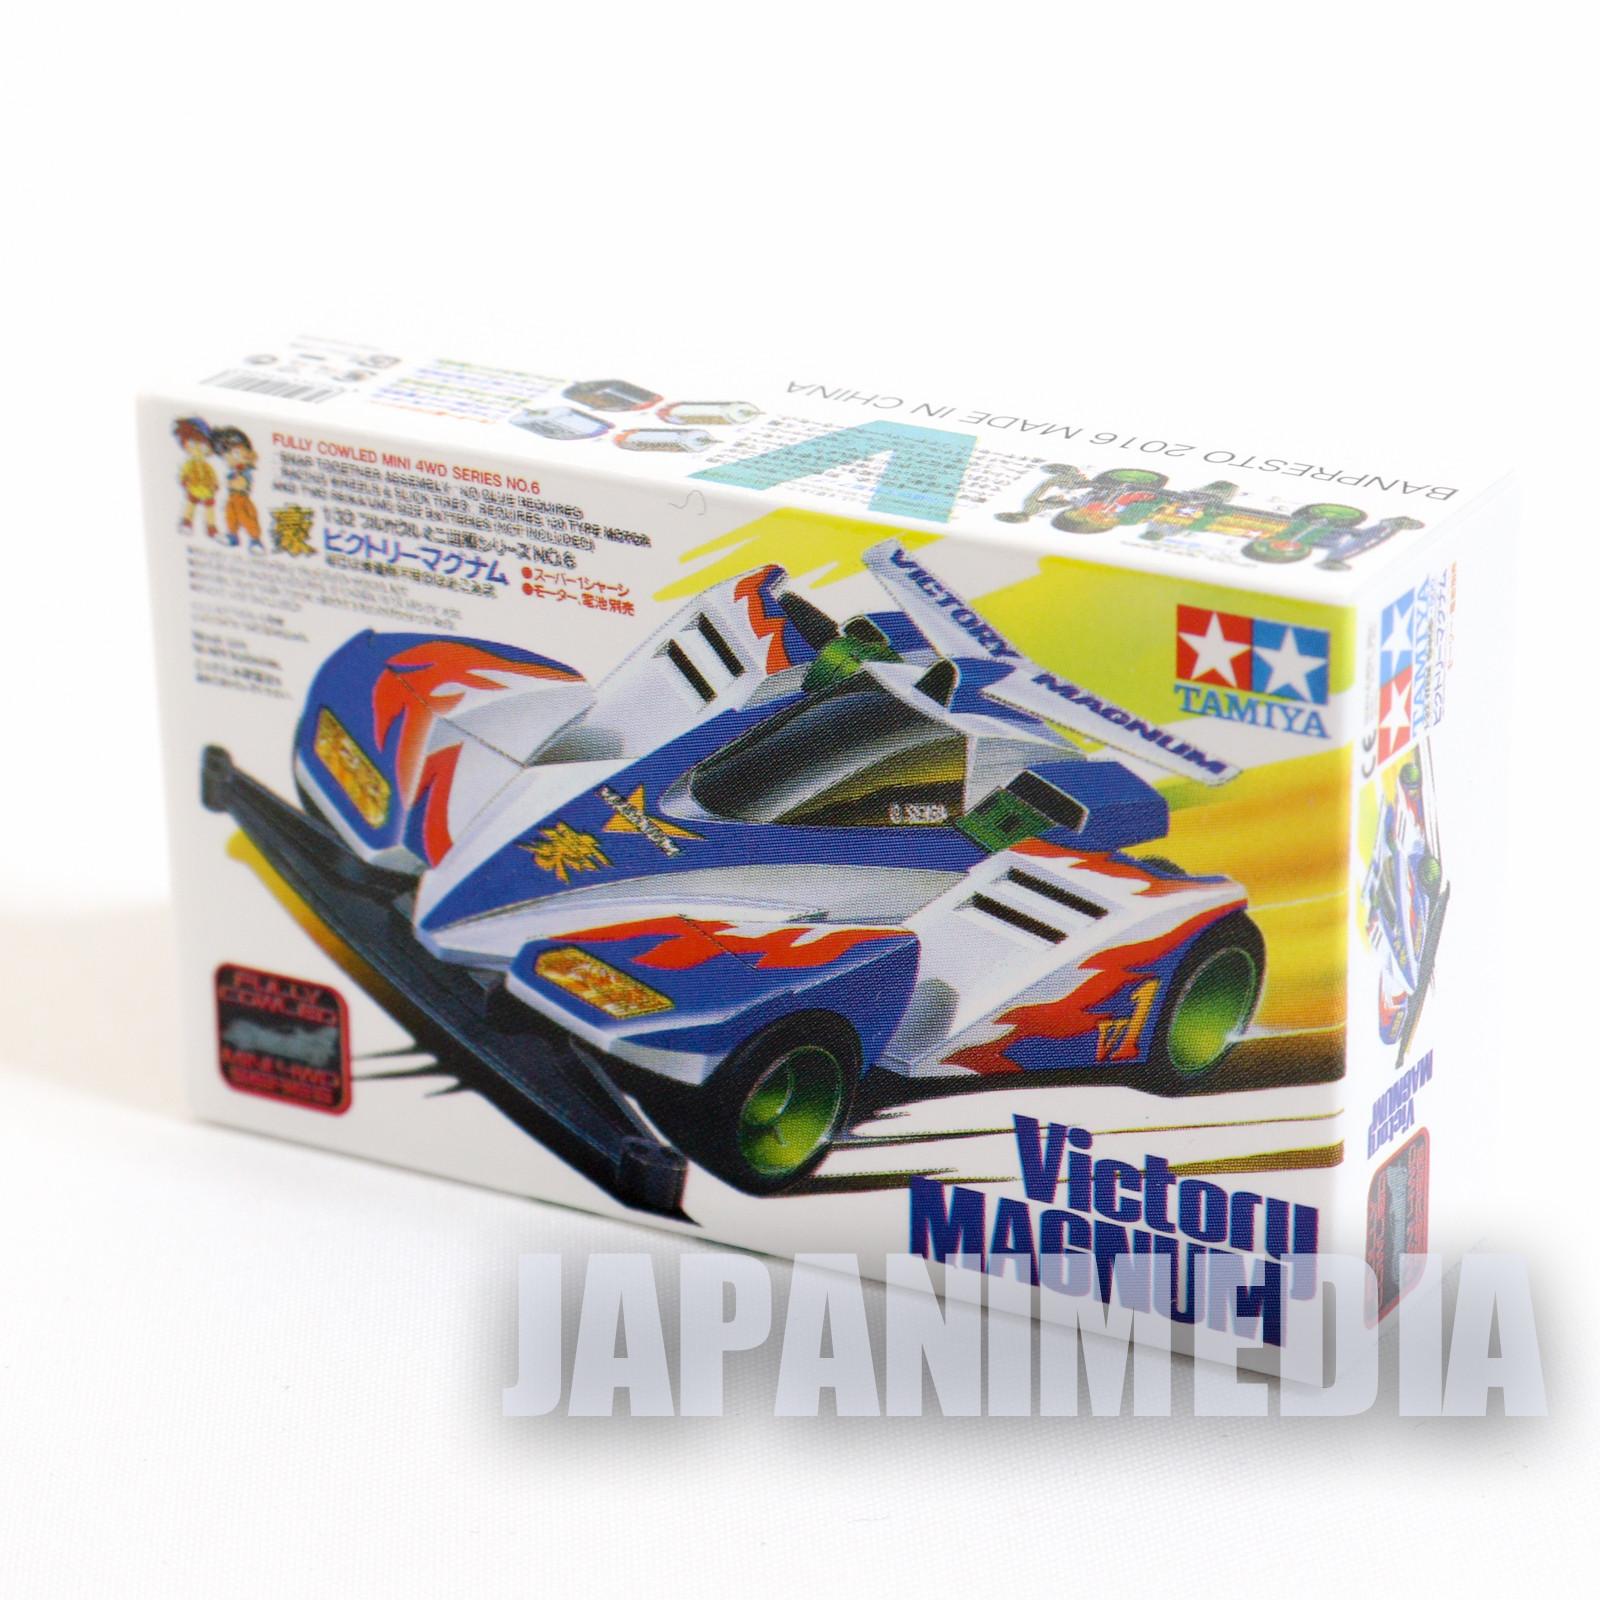 Bakusou Kyoudai Let's & Go!! Small Case Strap Mini 4WD Victory Magnum TAMIYA